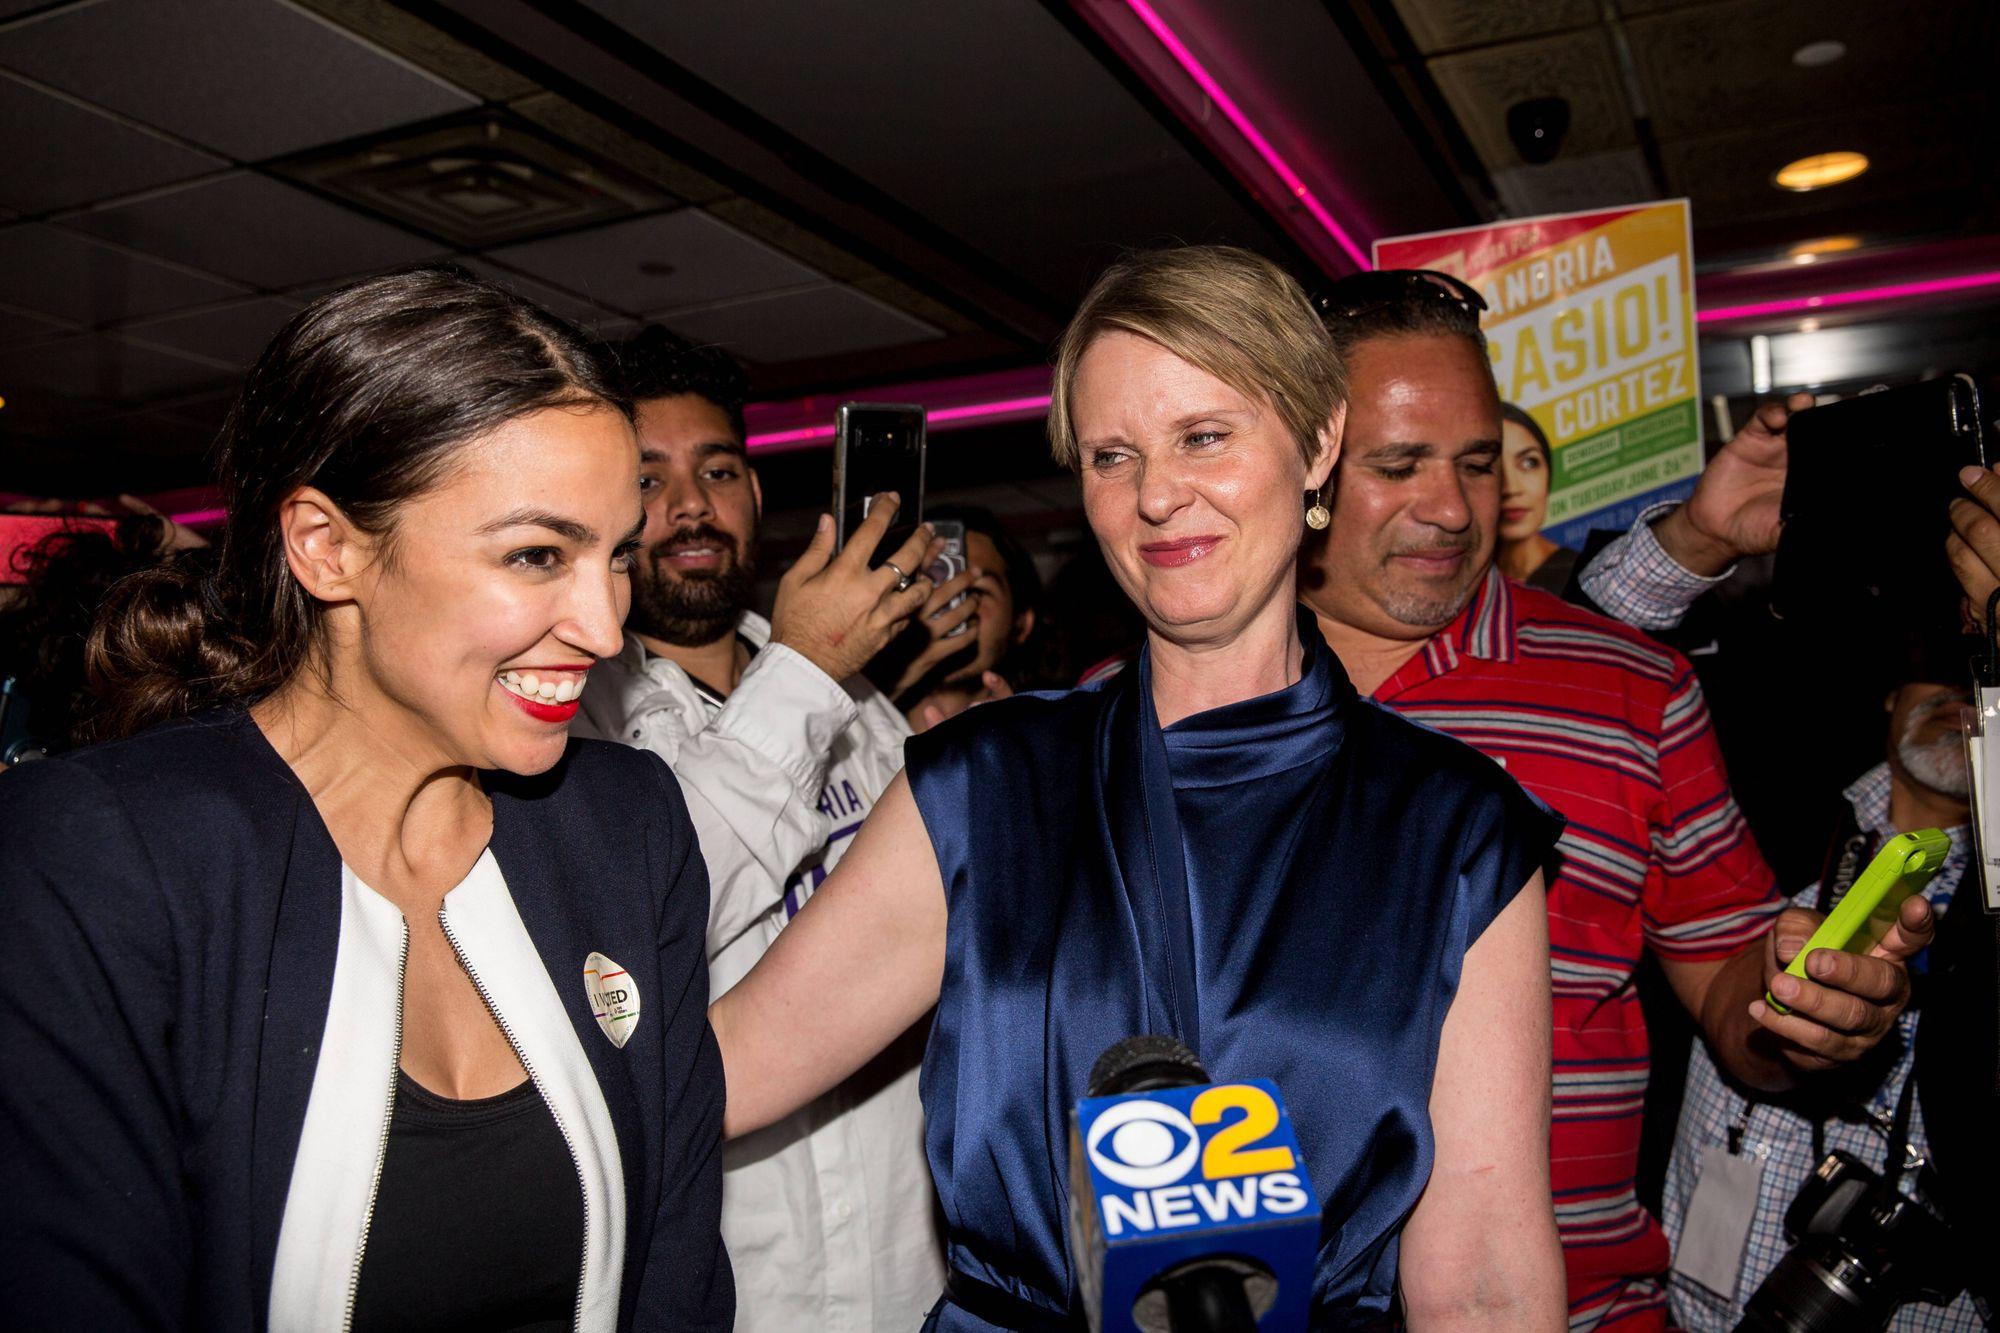 Ocasio-Cortez will Renovate the Democrats, Not the Left